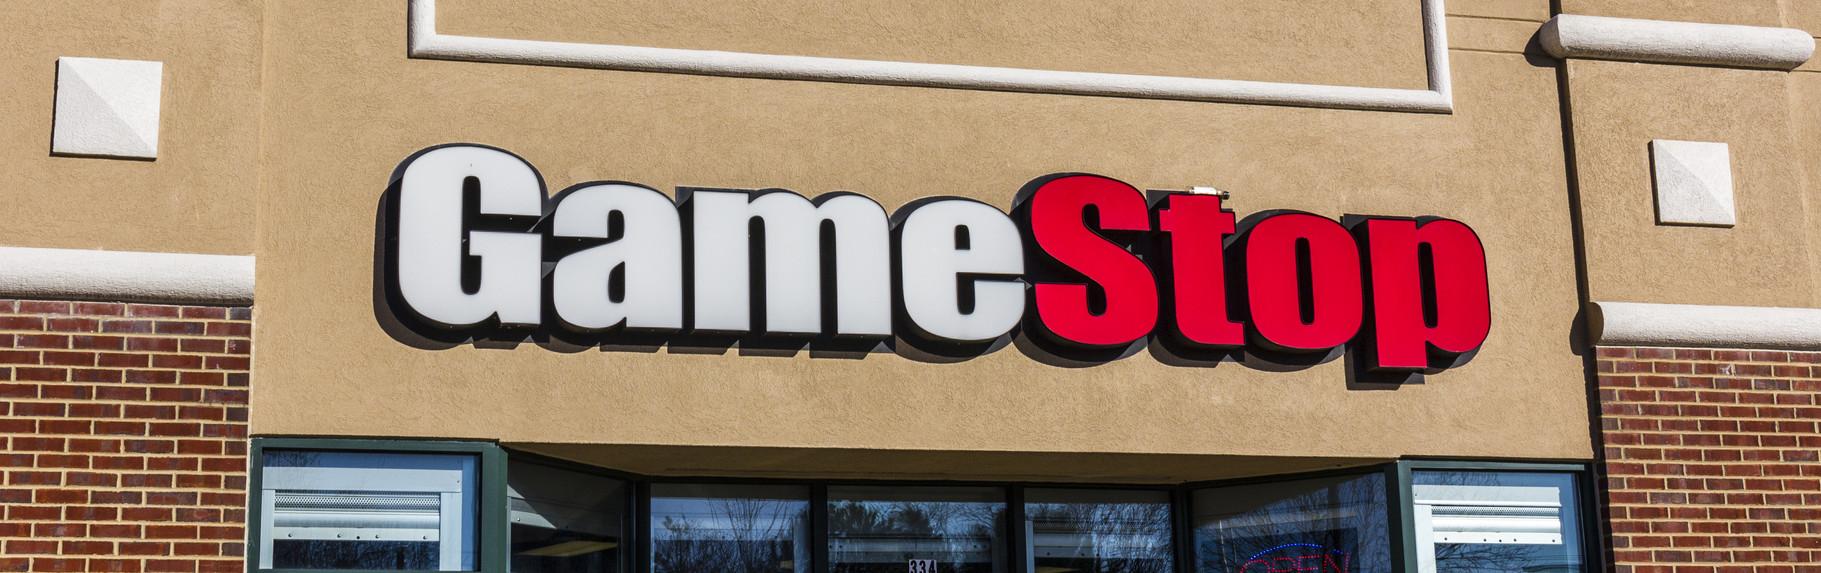 GameStop sign